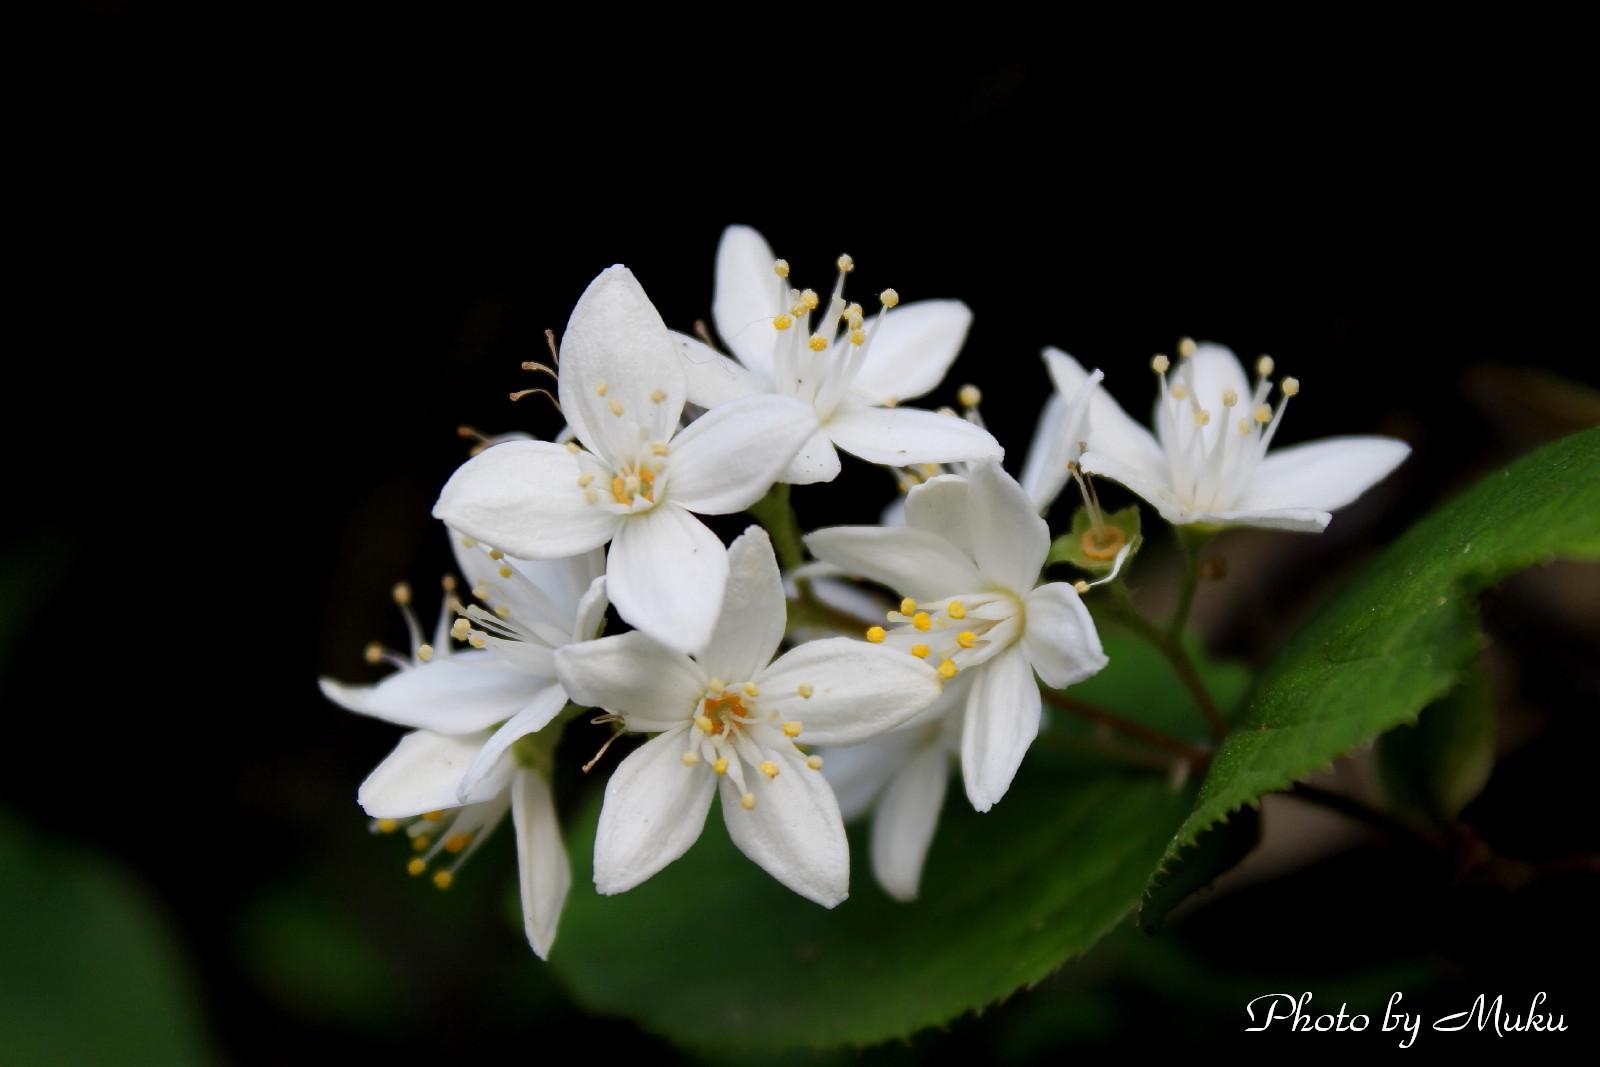 2014/05/02 四弁の卯の花(散歩道:神奈川県横須賀市)